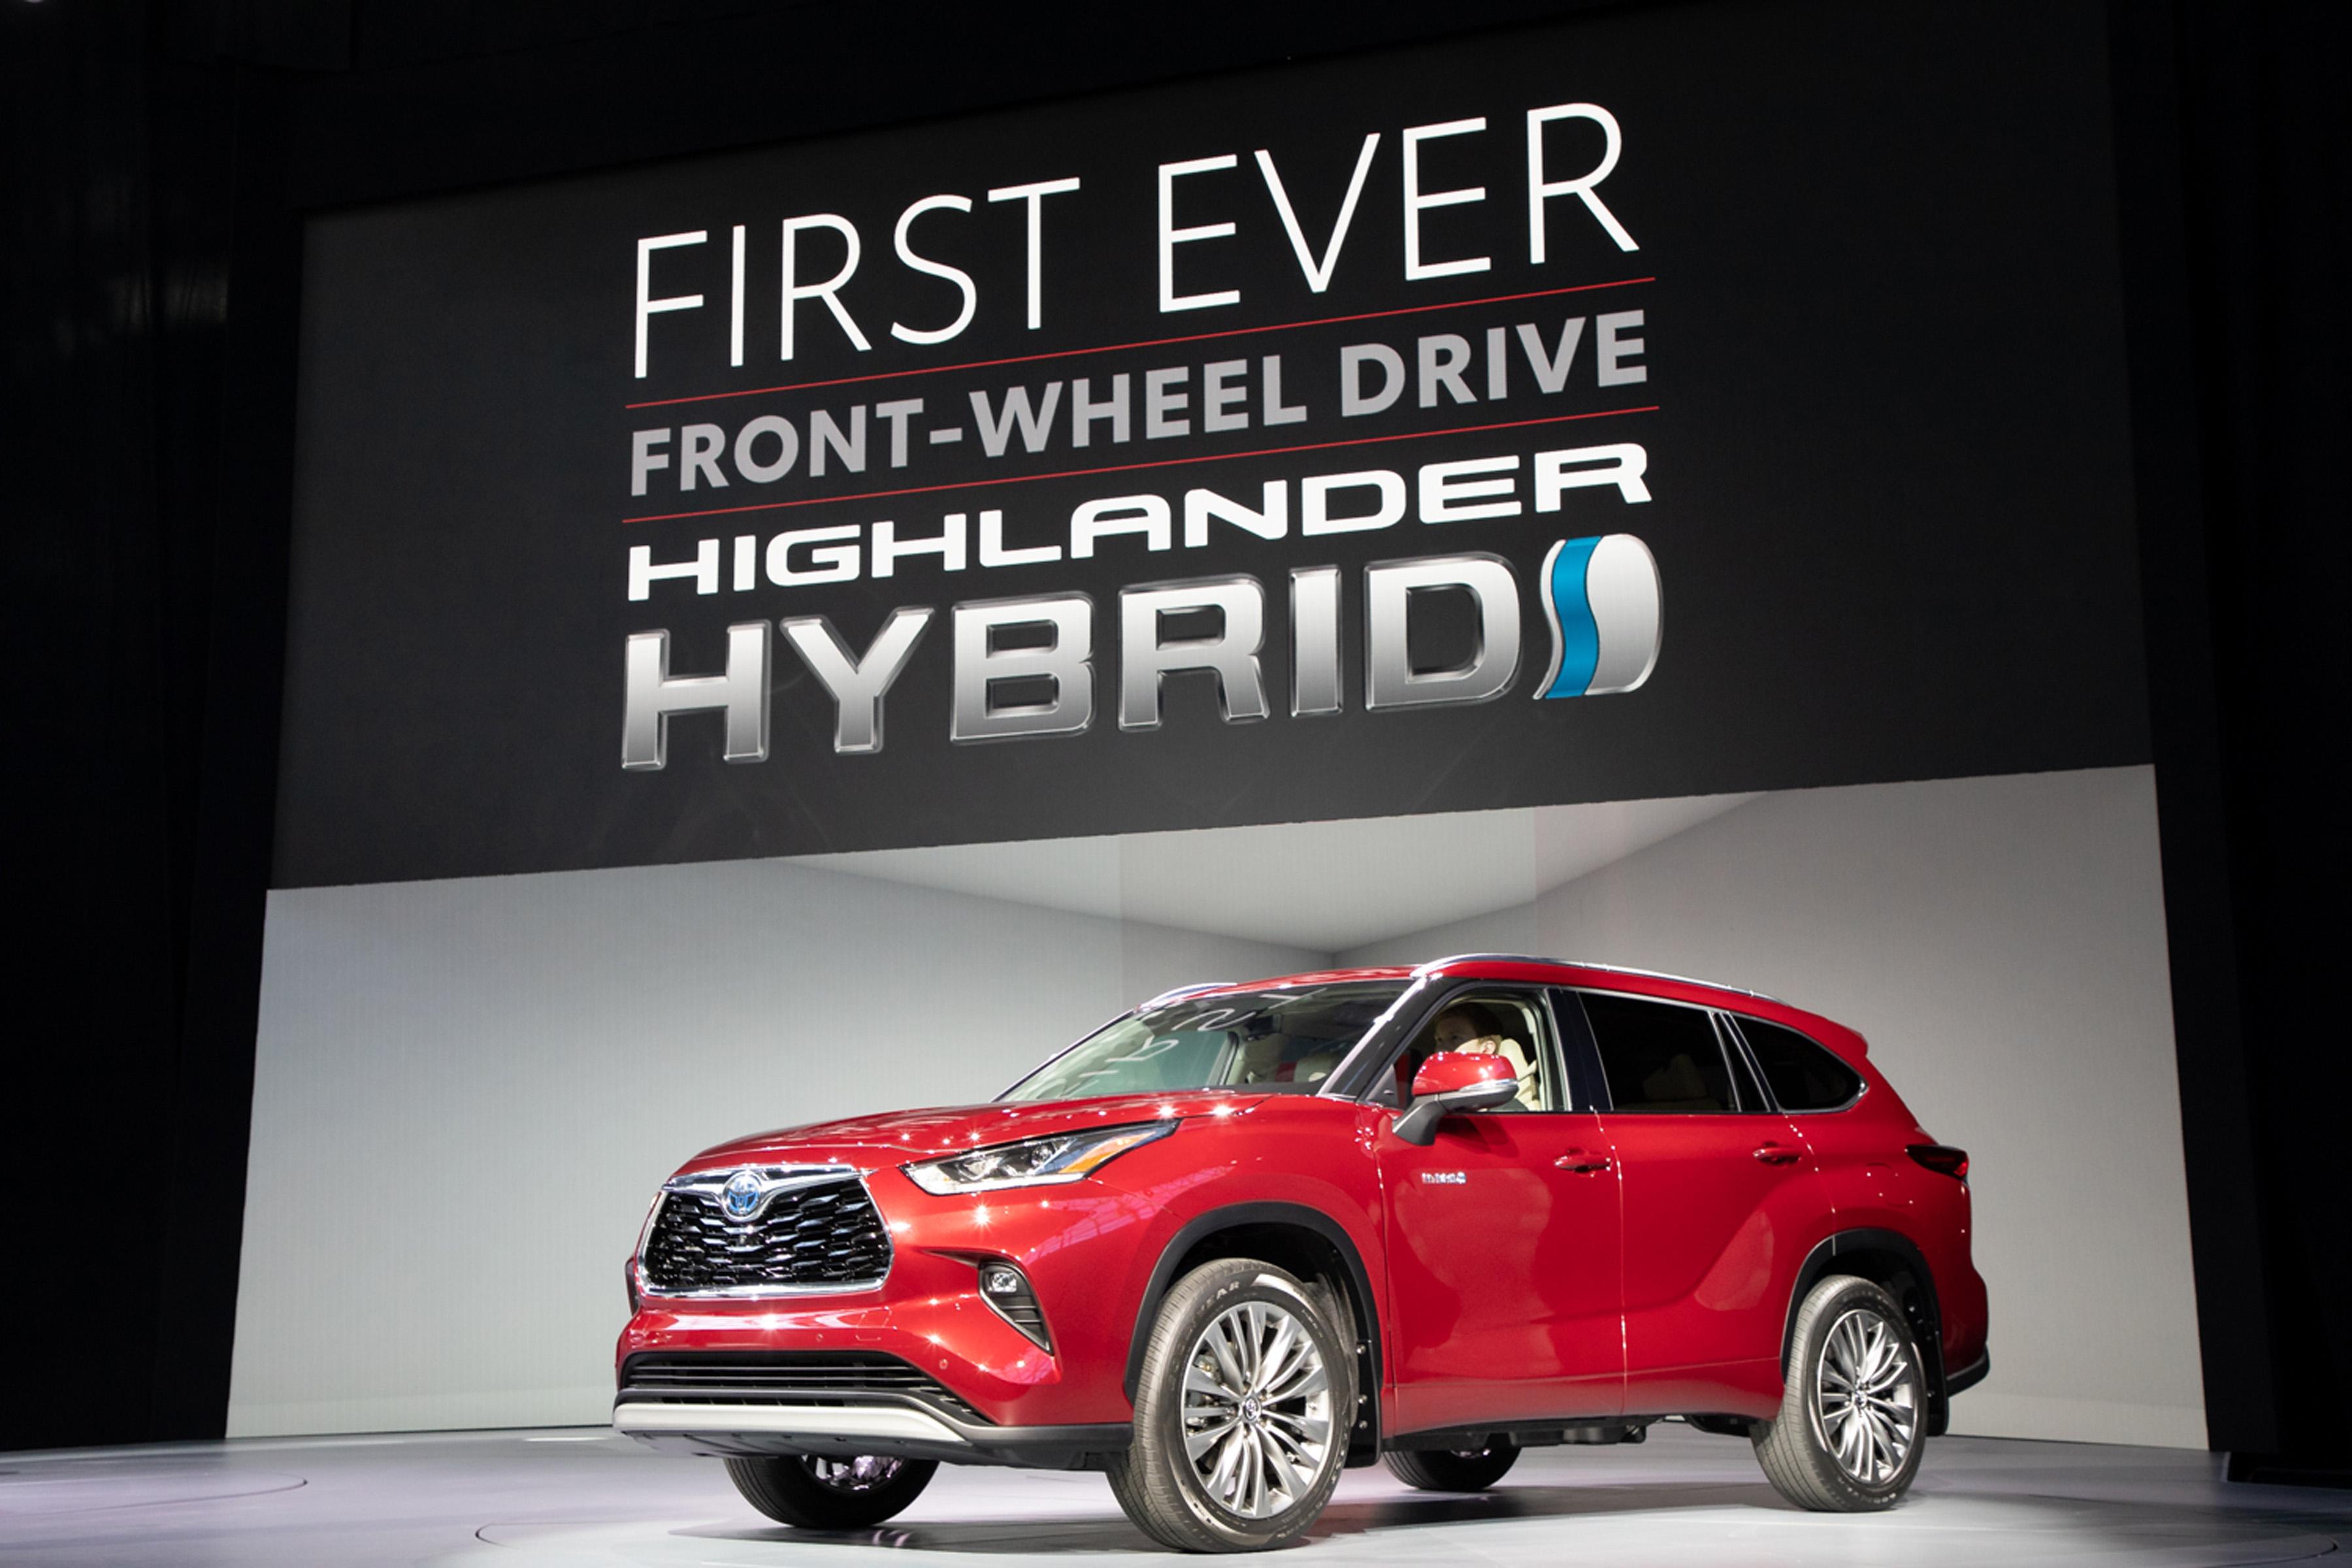 2019 nyias 03 9f3ca69bc5b6bd26bcc69b7135c4581b05255eab 1024x683 - Toyota introduces their 2020 Highlander SUV